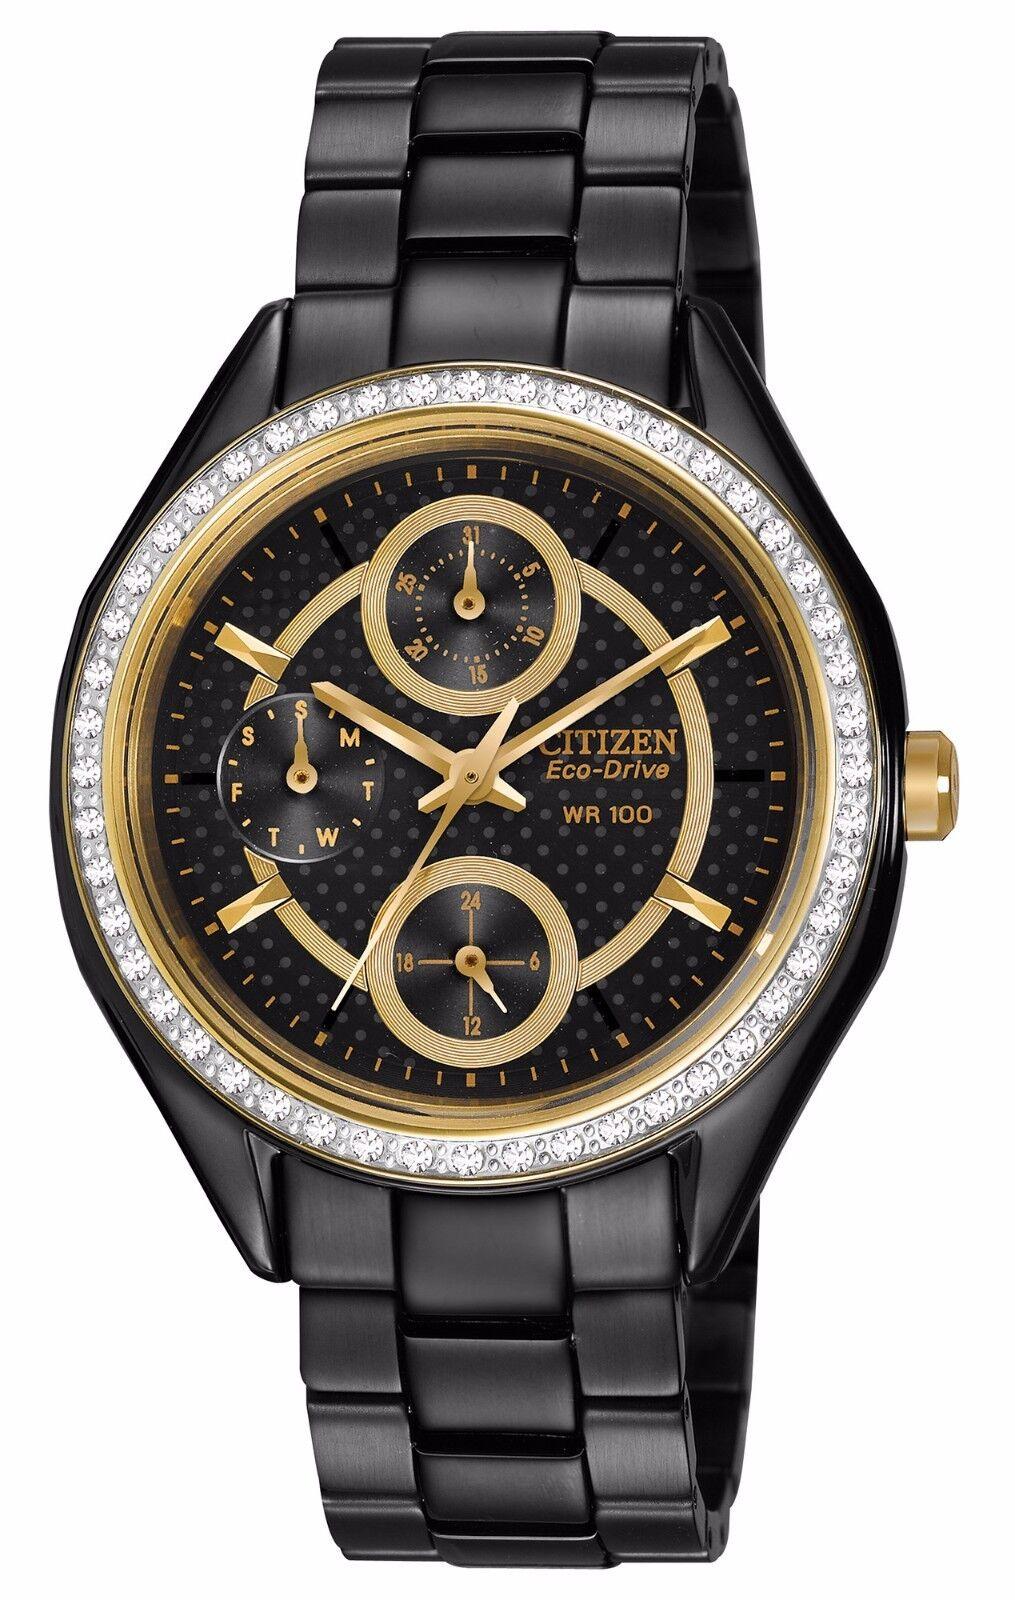 Citizen-Eco-Drive-Women-s-FD1068-53E-Swarvoski-Crystal-Bezel-Black-Watch